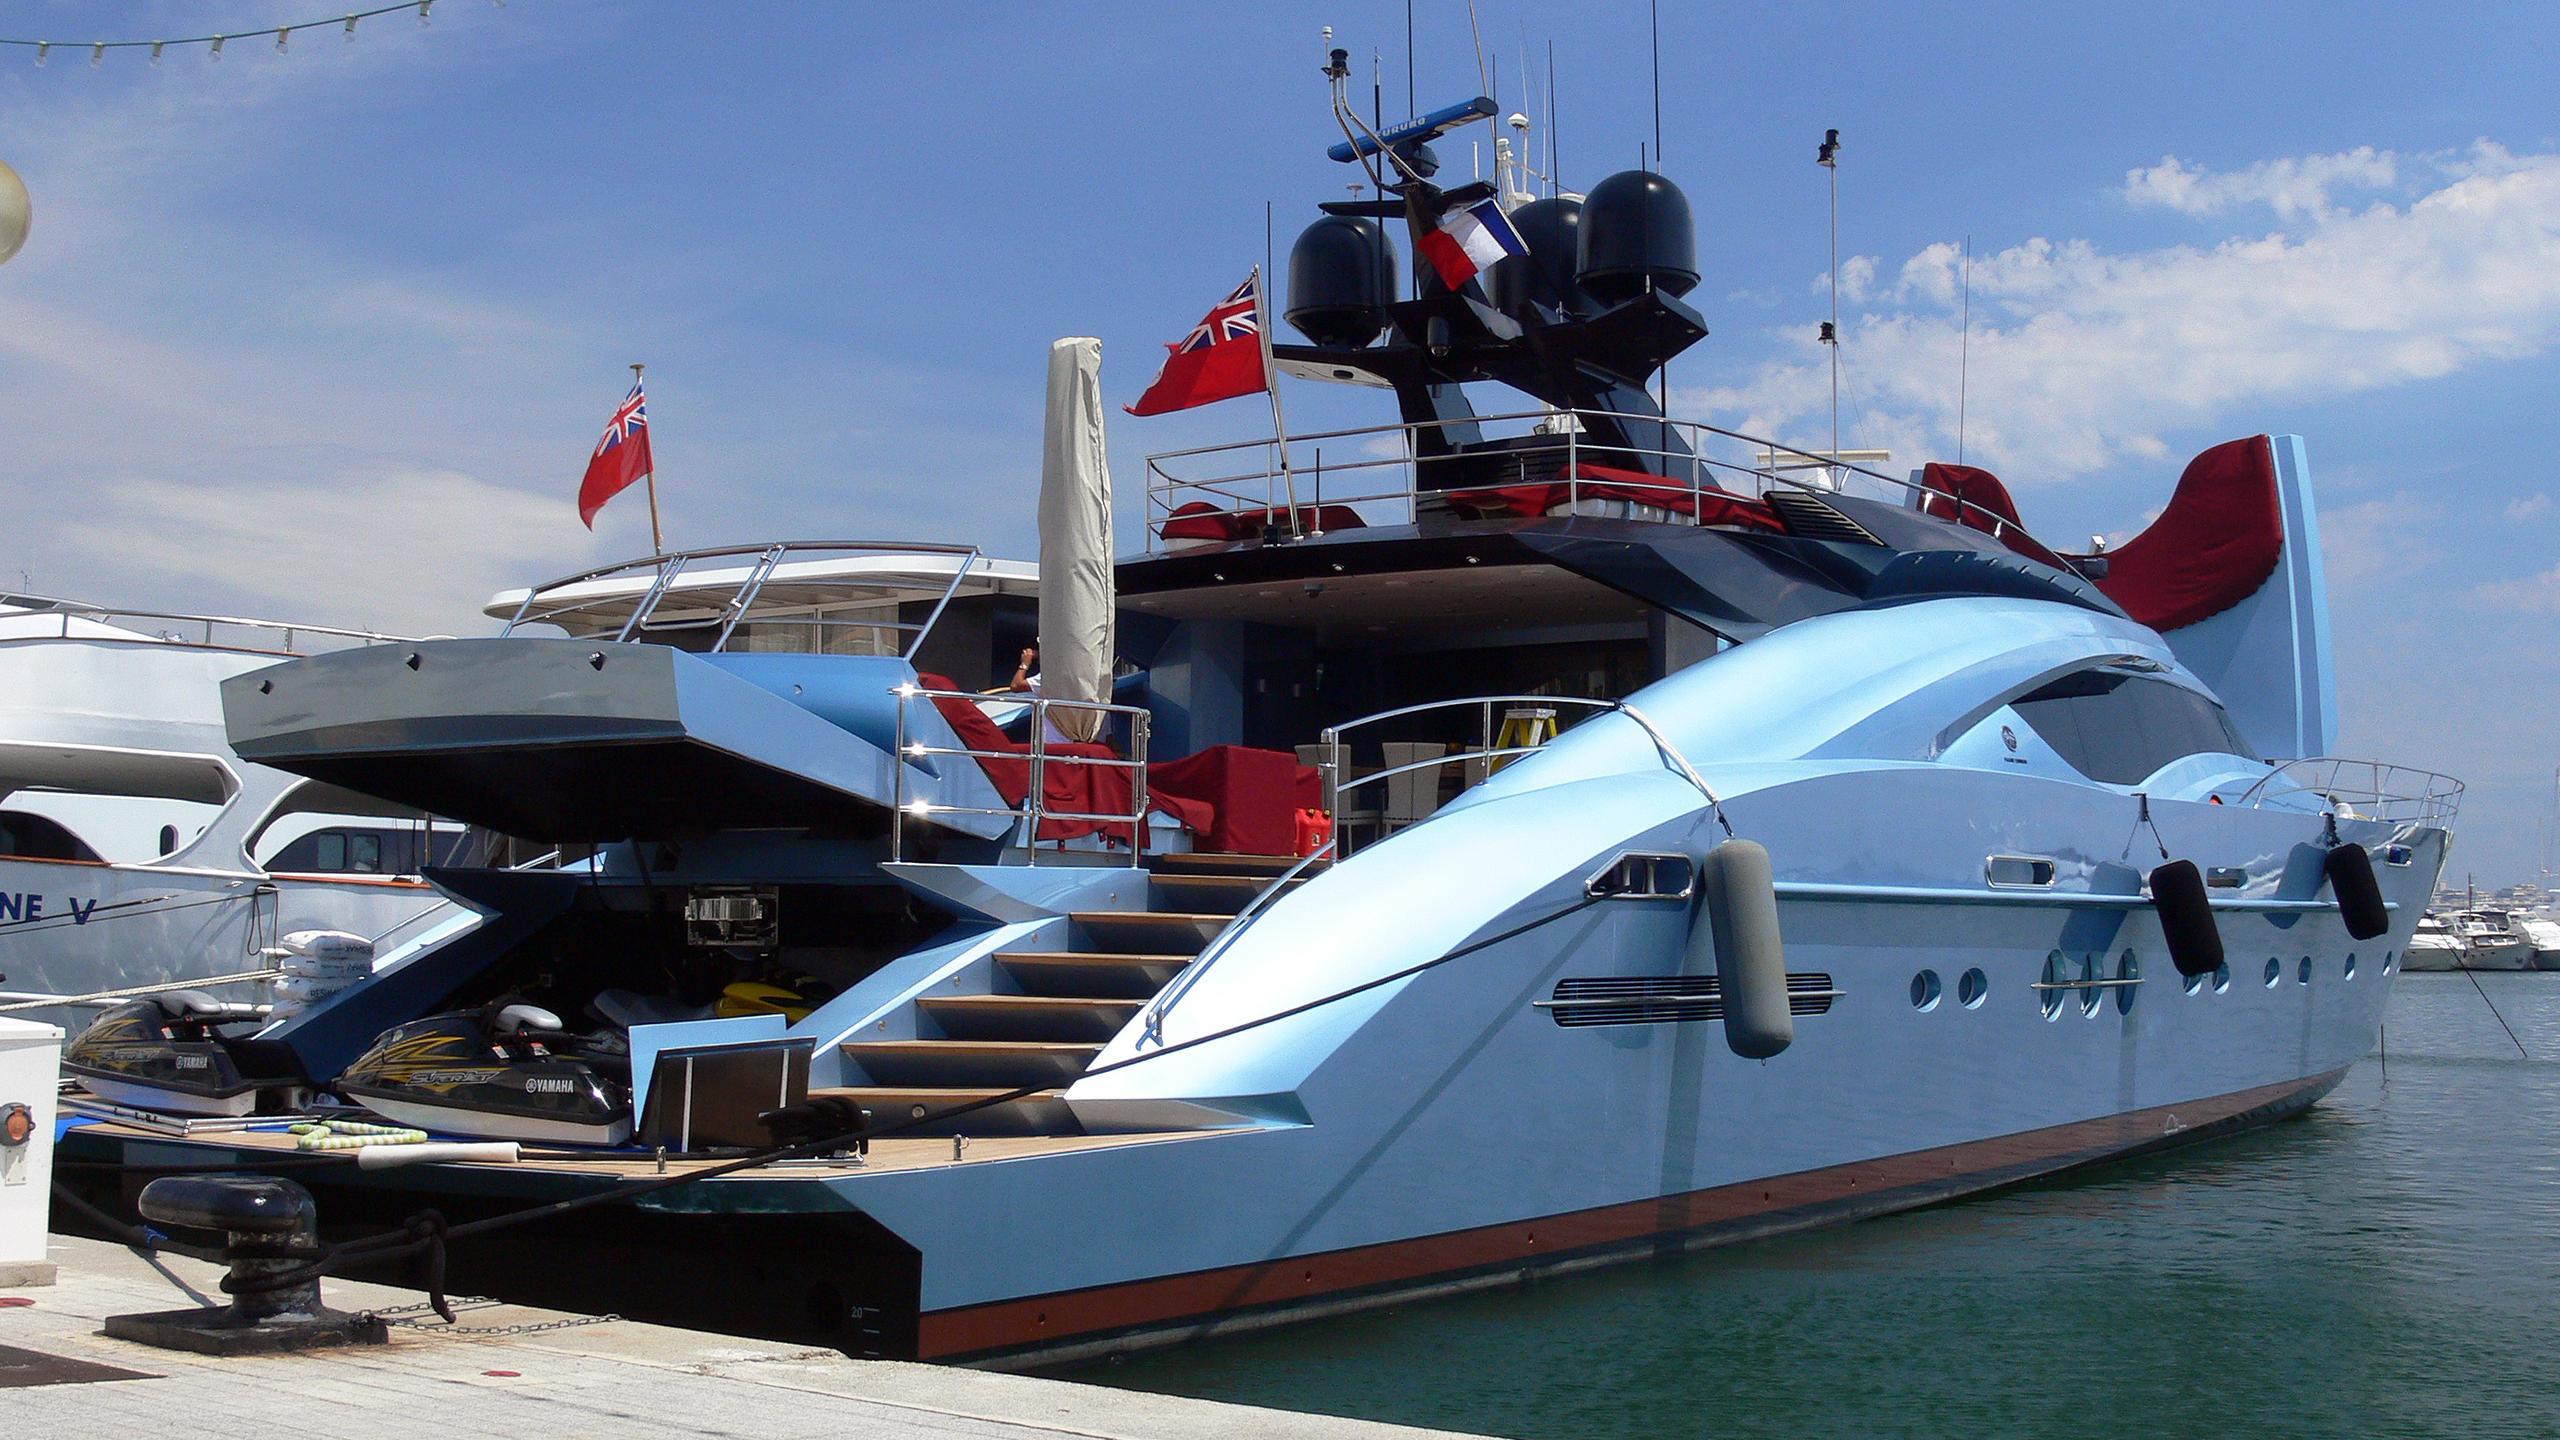 waverunner-motor-yacht-palmer-johnson-135-my-2007-41m-stern